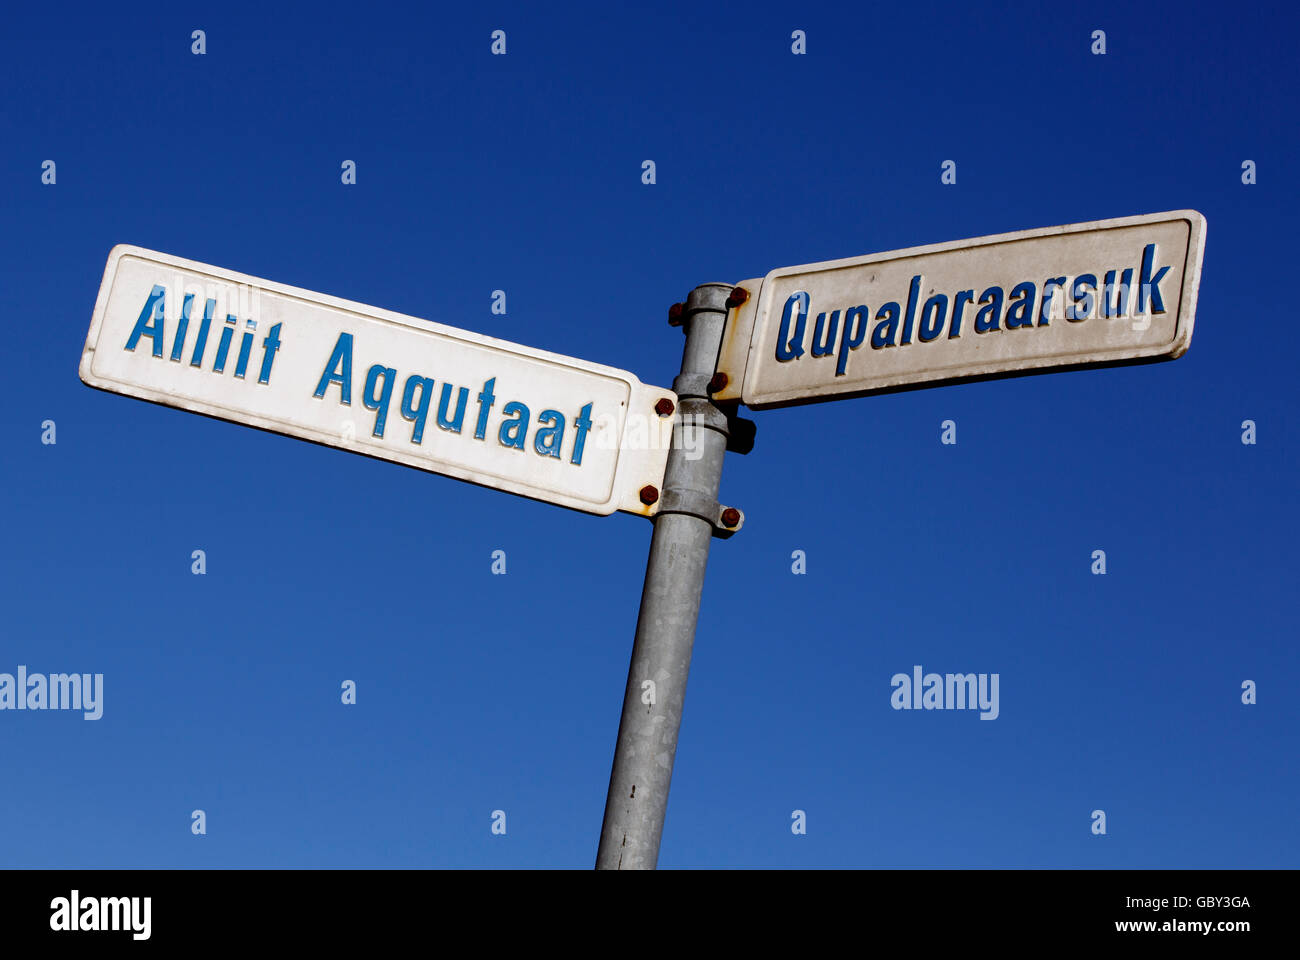 Greenlandic language street signs, Ilulissat, Greenland - Stock Image